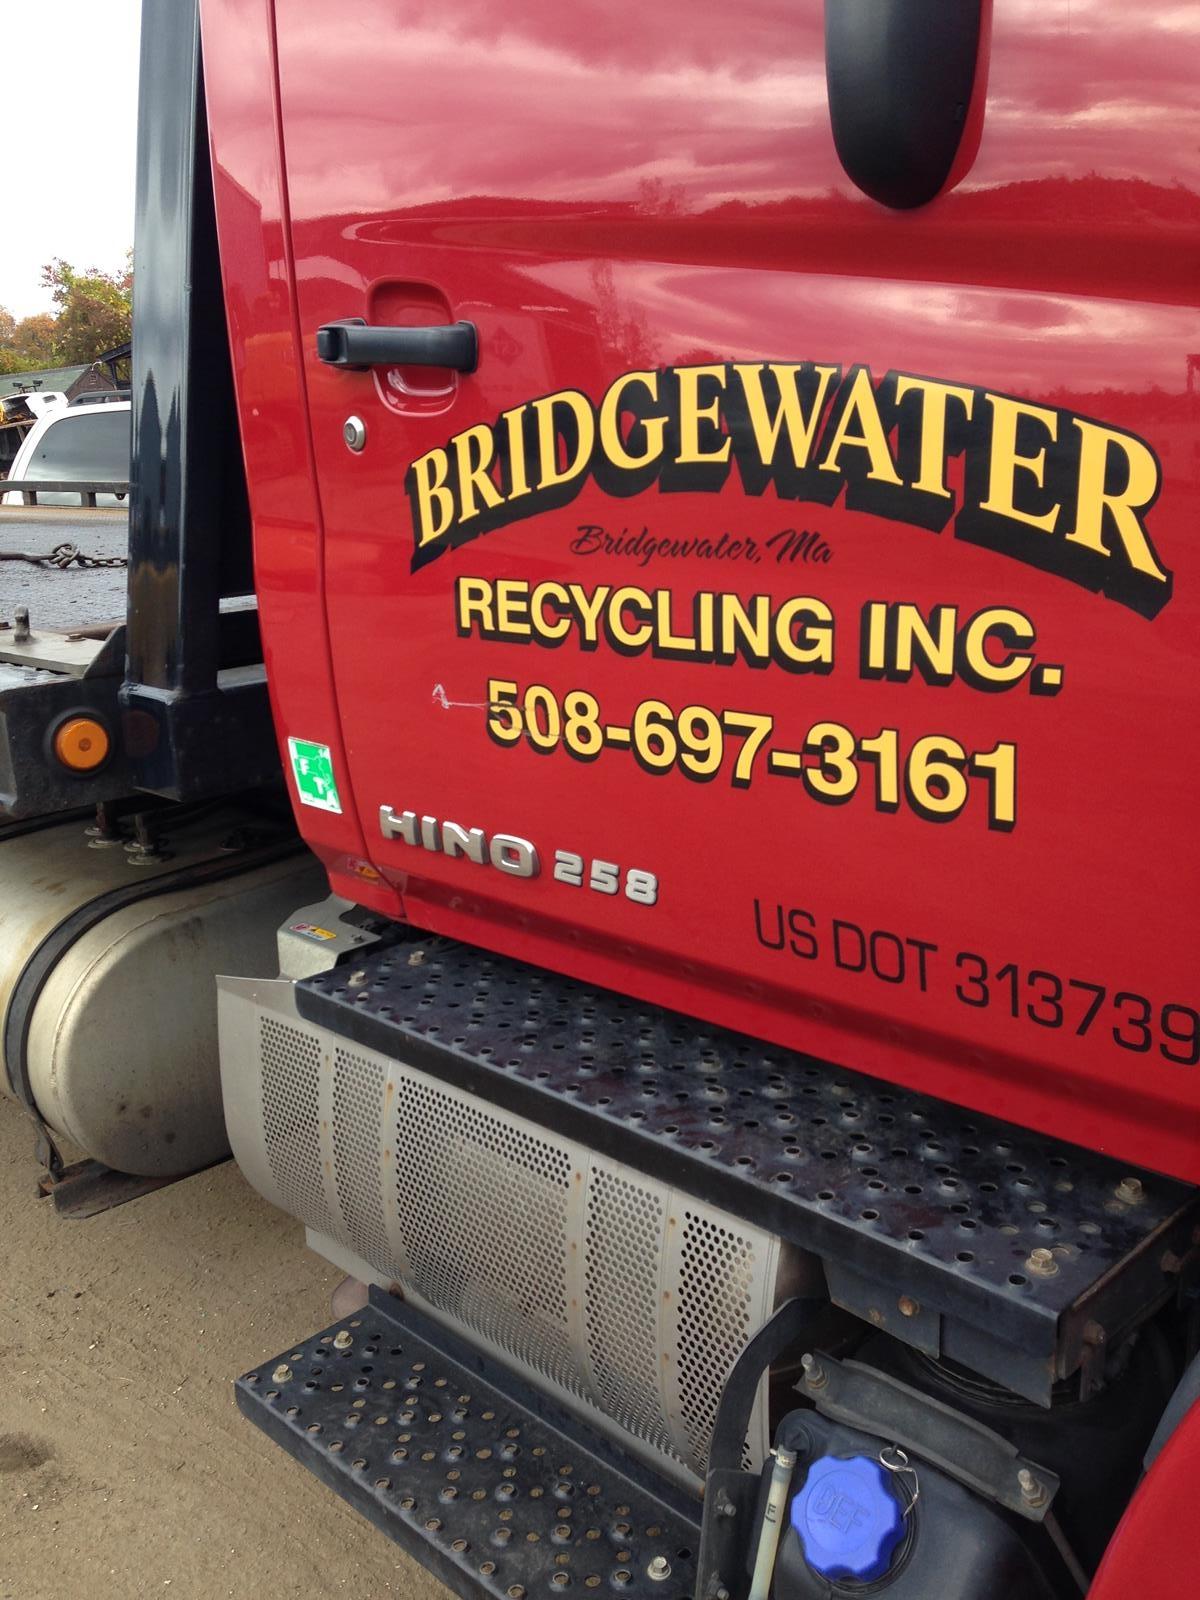 Bridgewater Recycling Inc